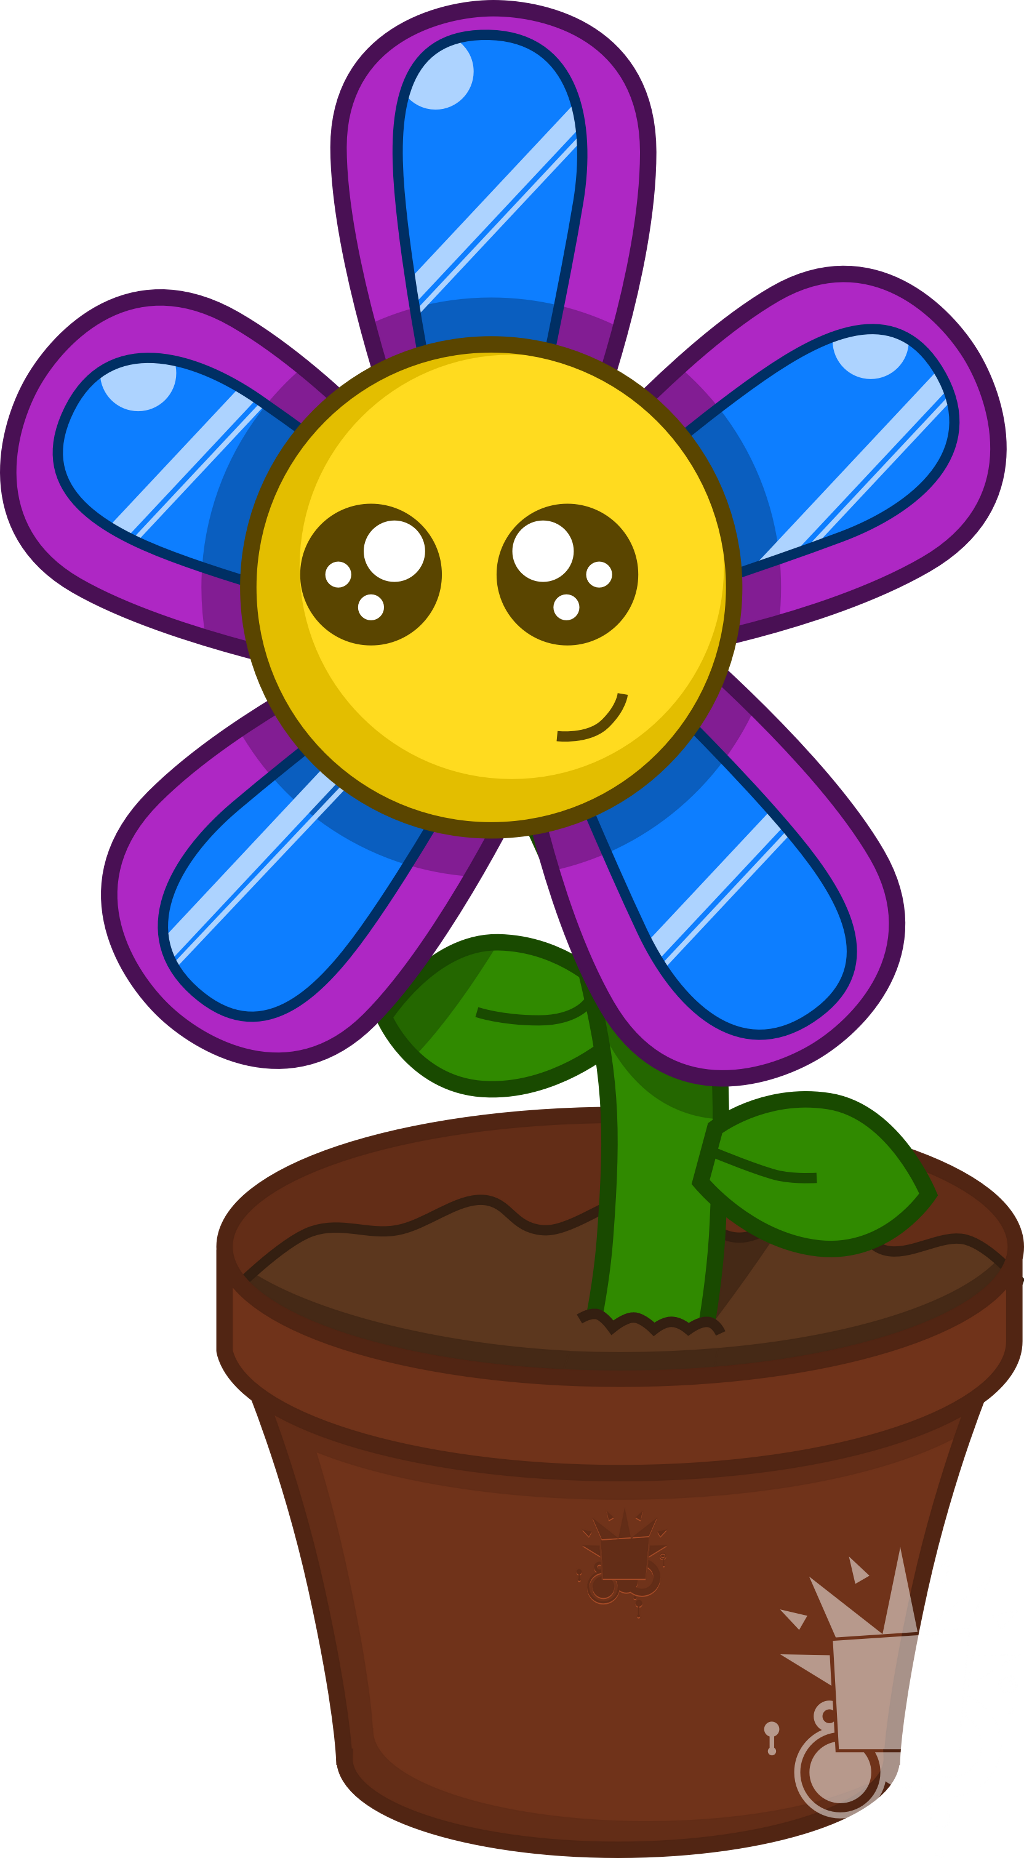 Happy Flower by Phlum